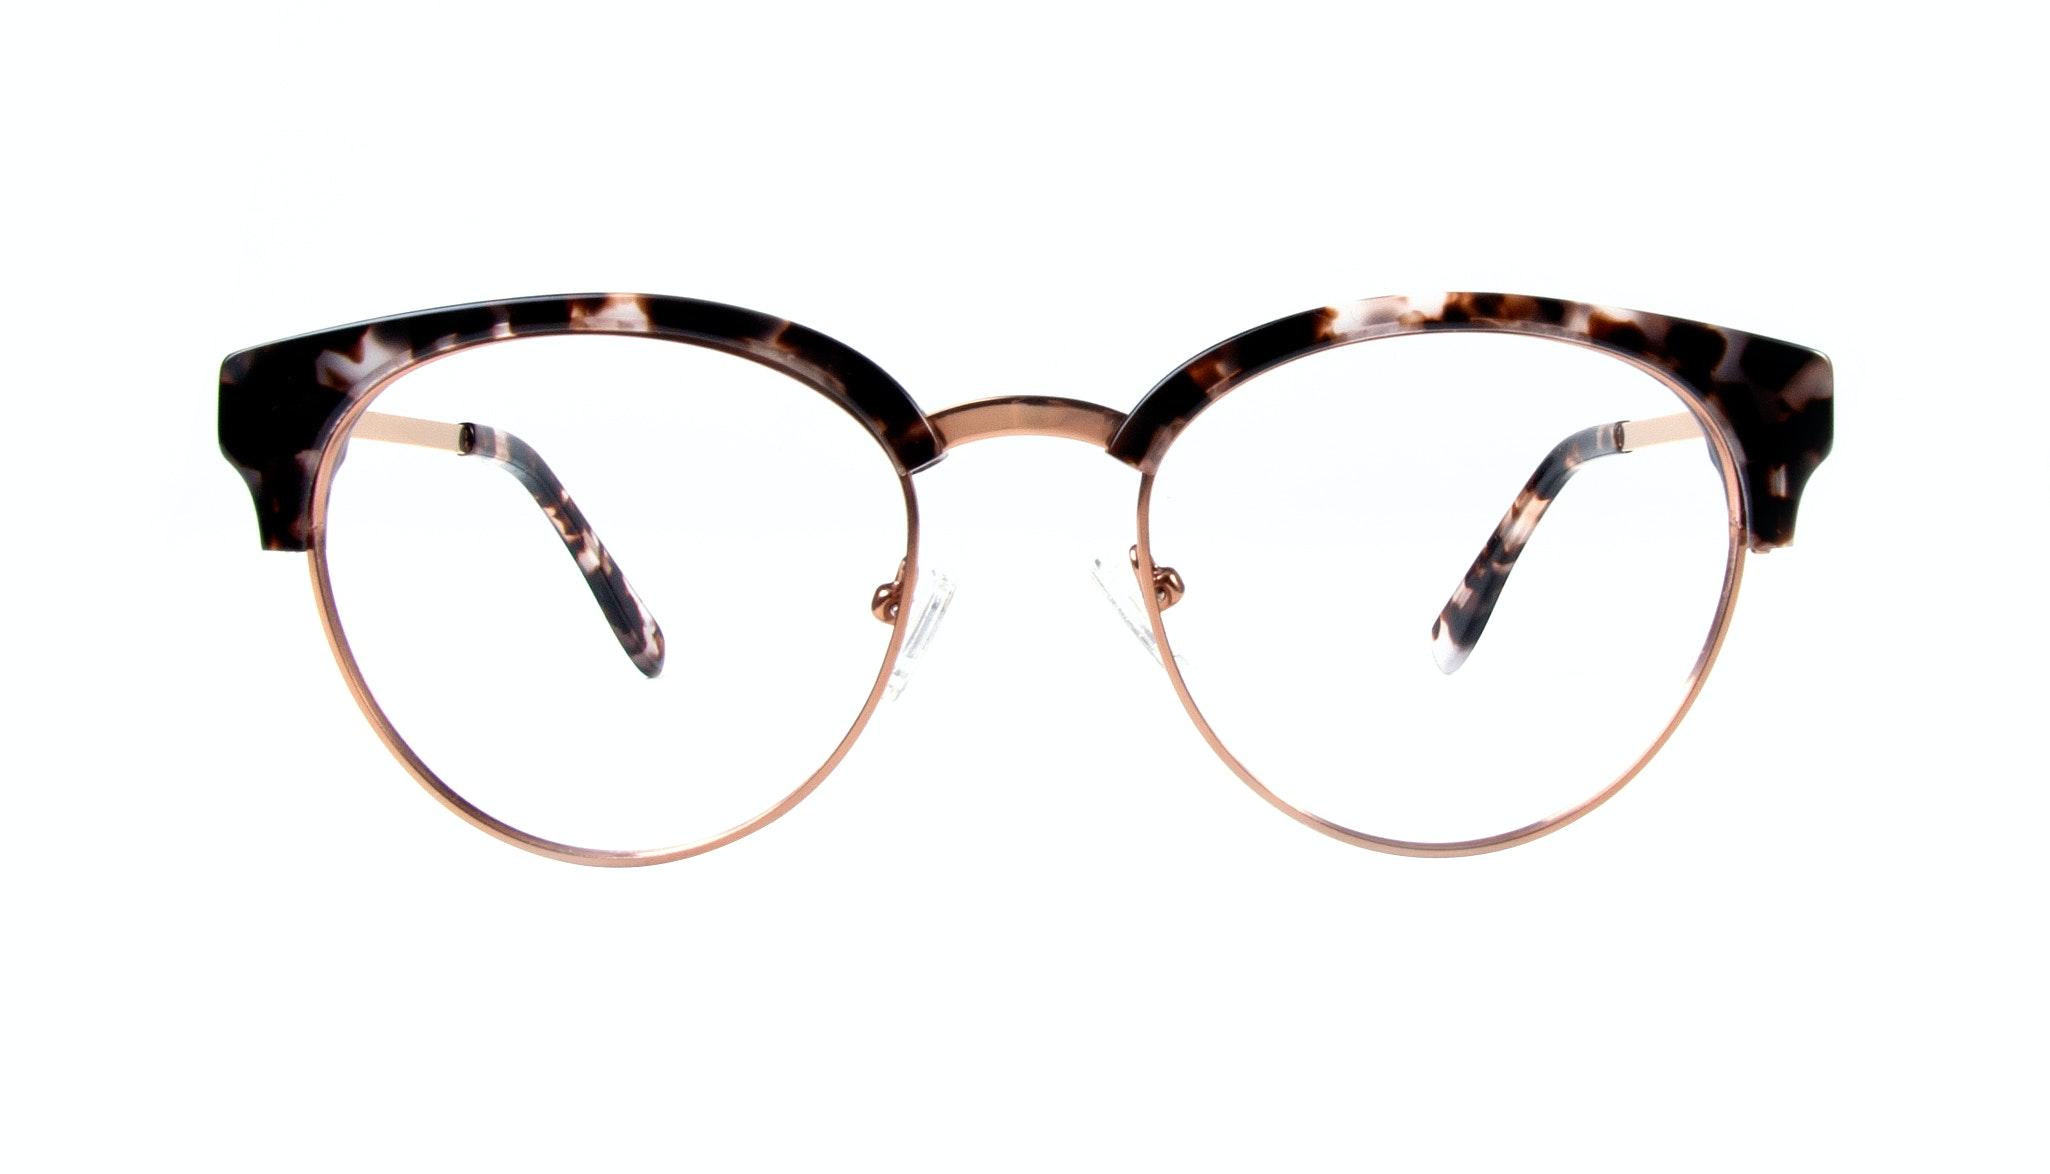 Affordable Fashion Glasses Round Eyeglasses Women Allure Mocha Tortoise Front